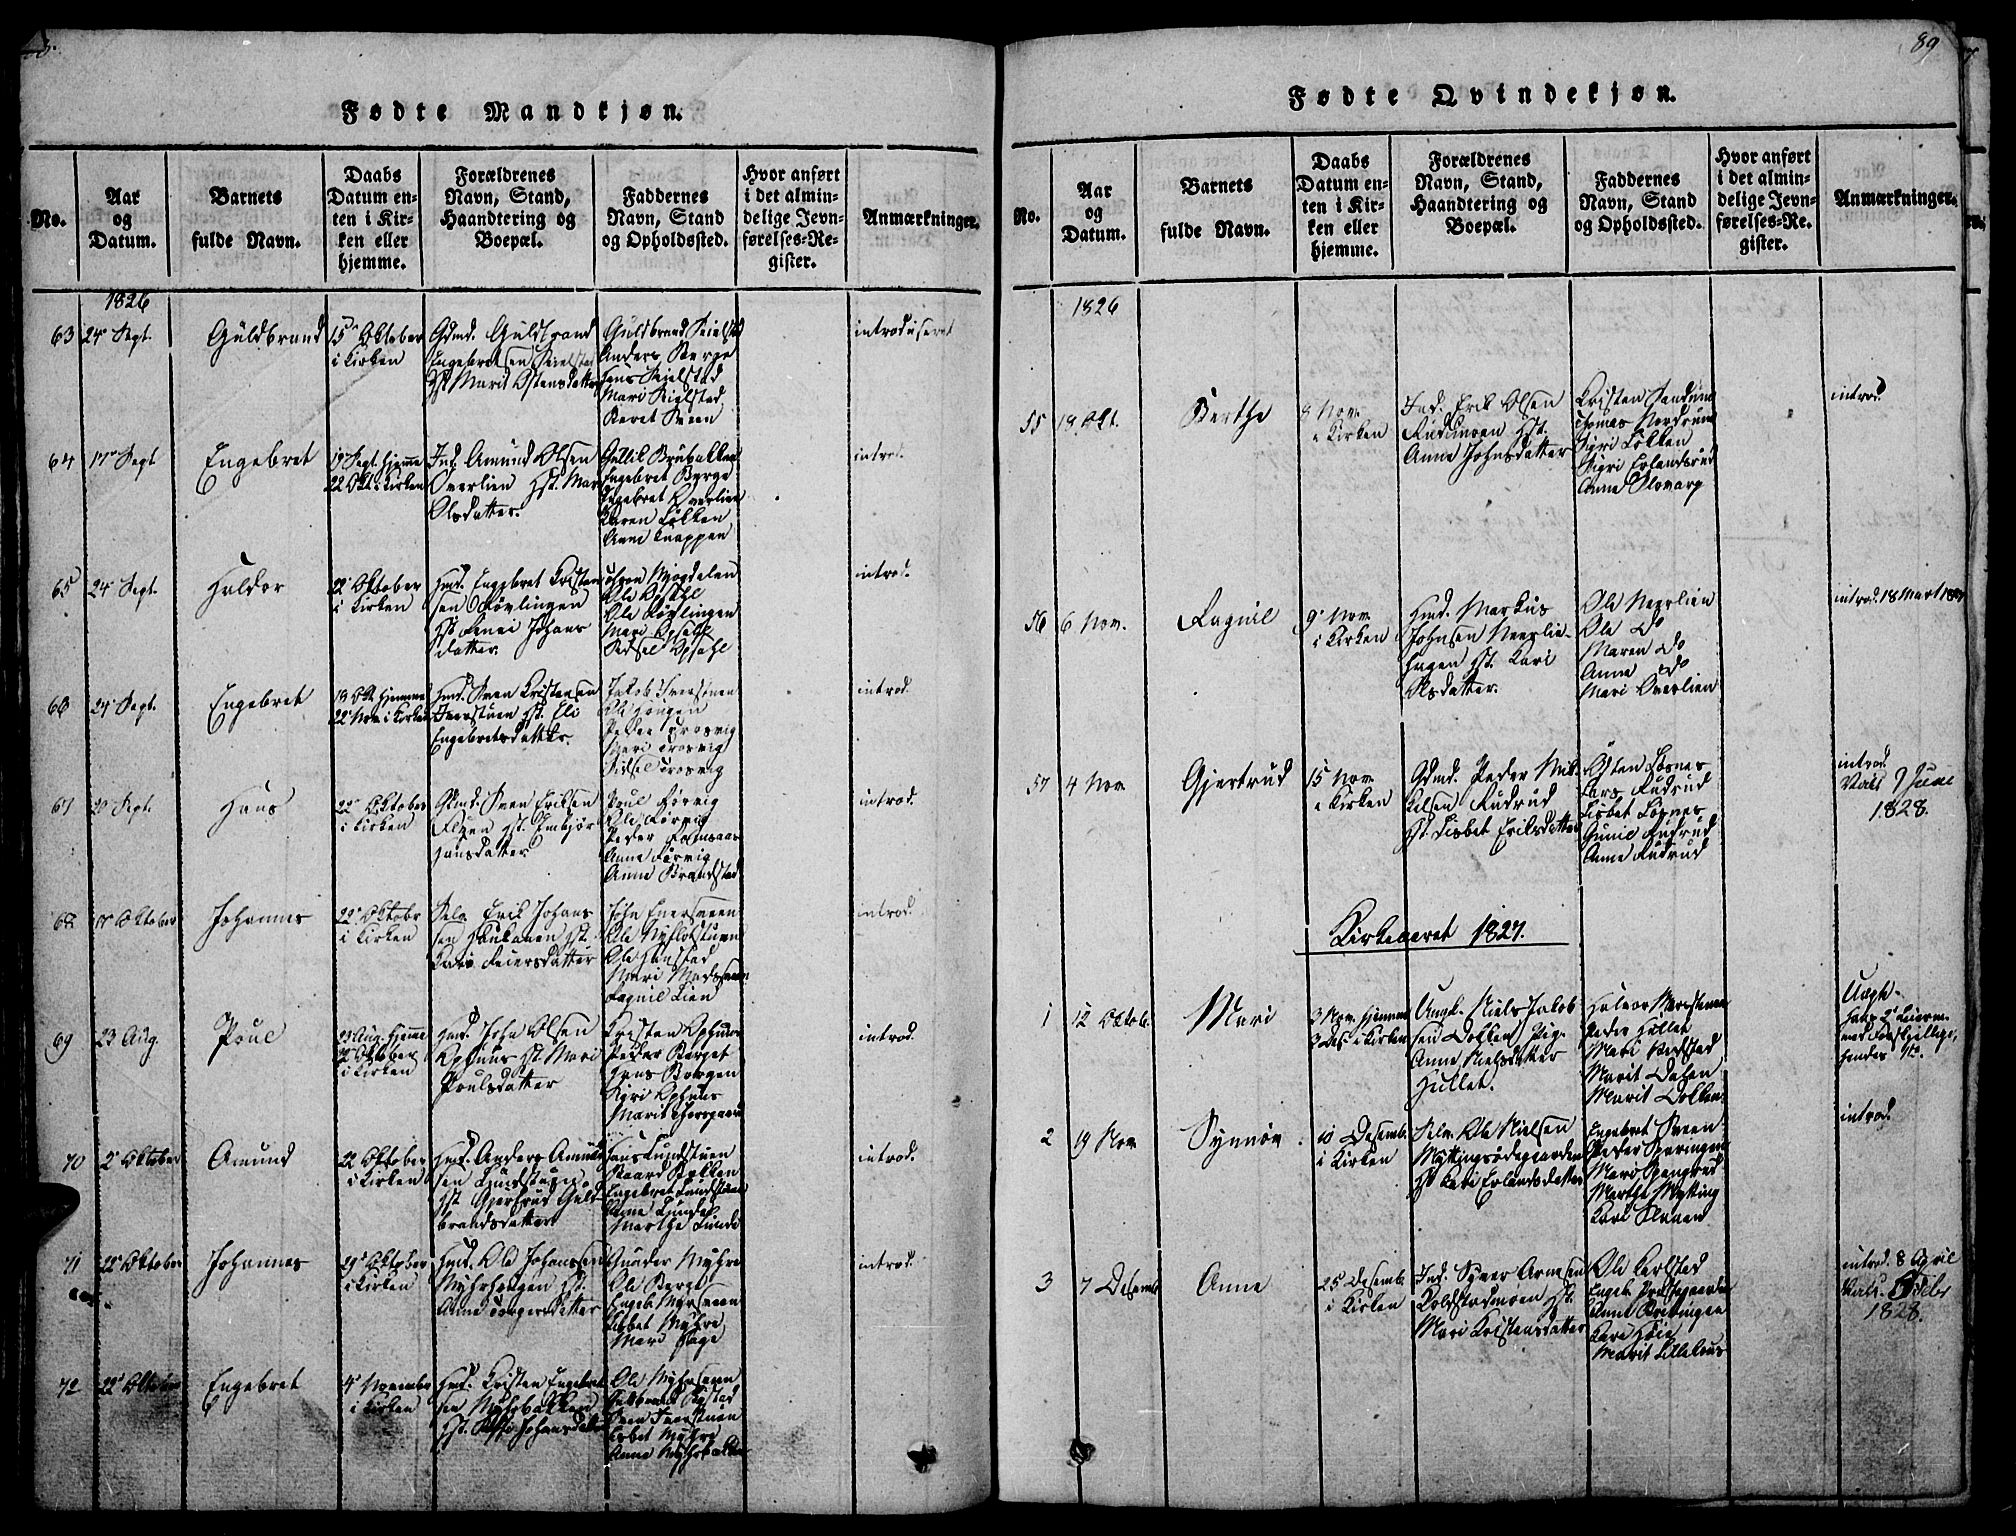 SAH, Ringebu prestekontor, Ministerialbok nr. 4, 1821-1839, s. 88-89